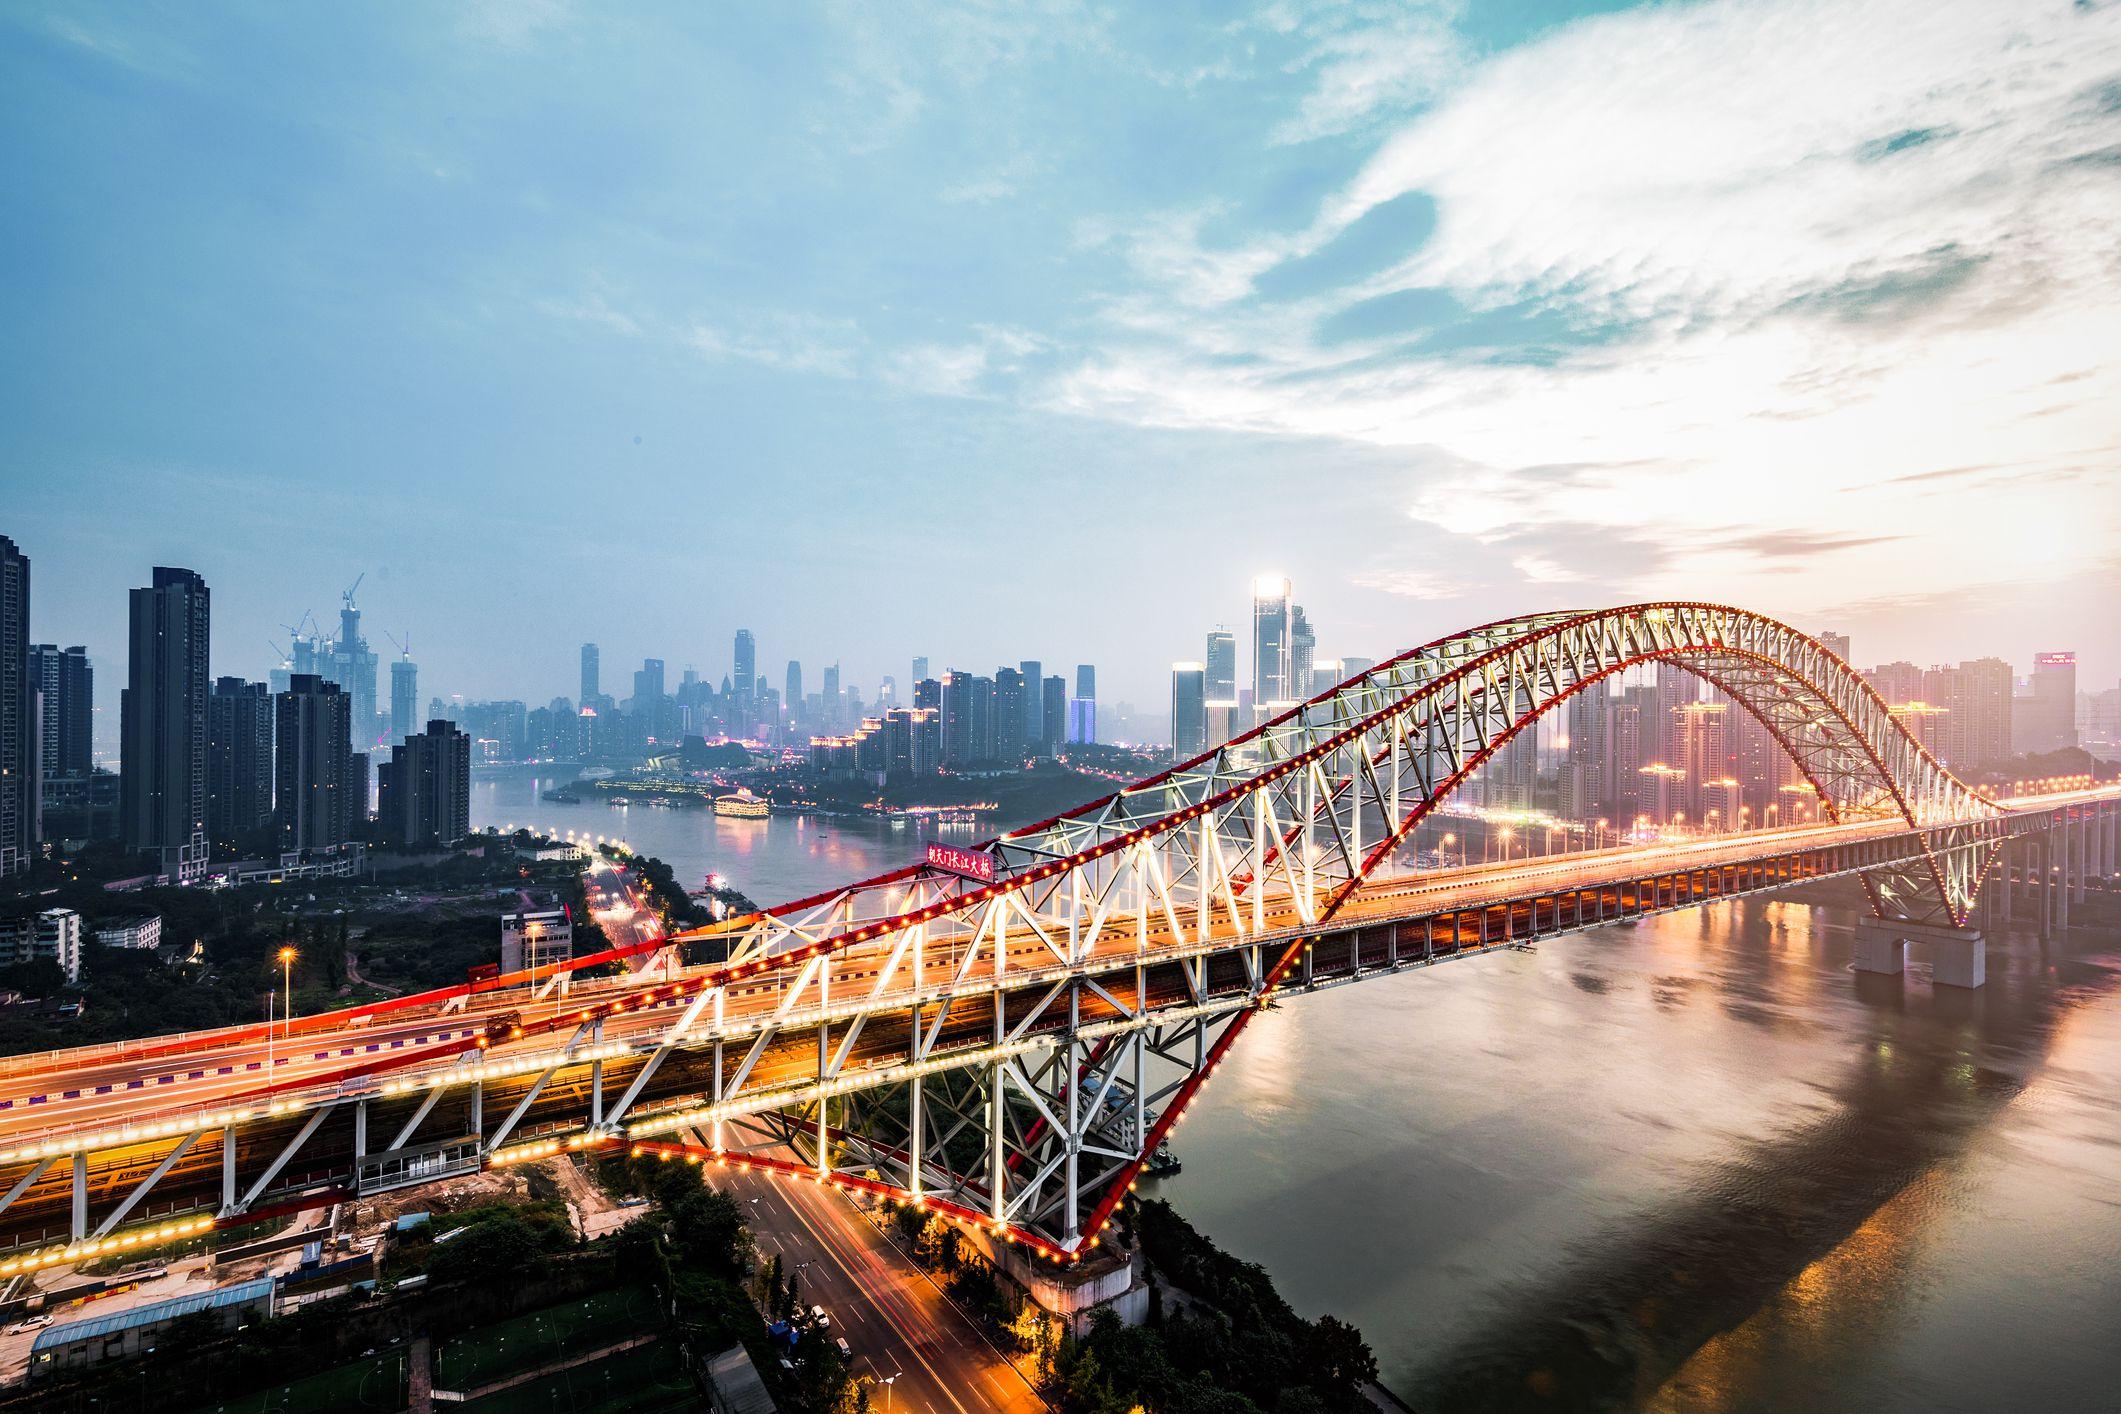 11 best things to do in chongqing  china